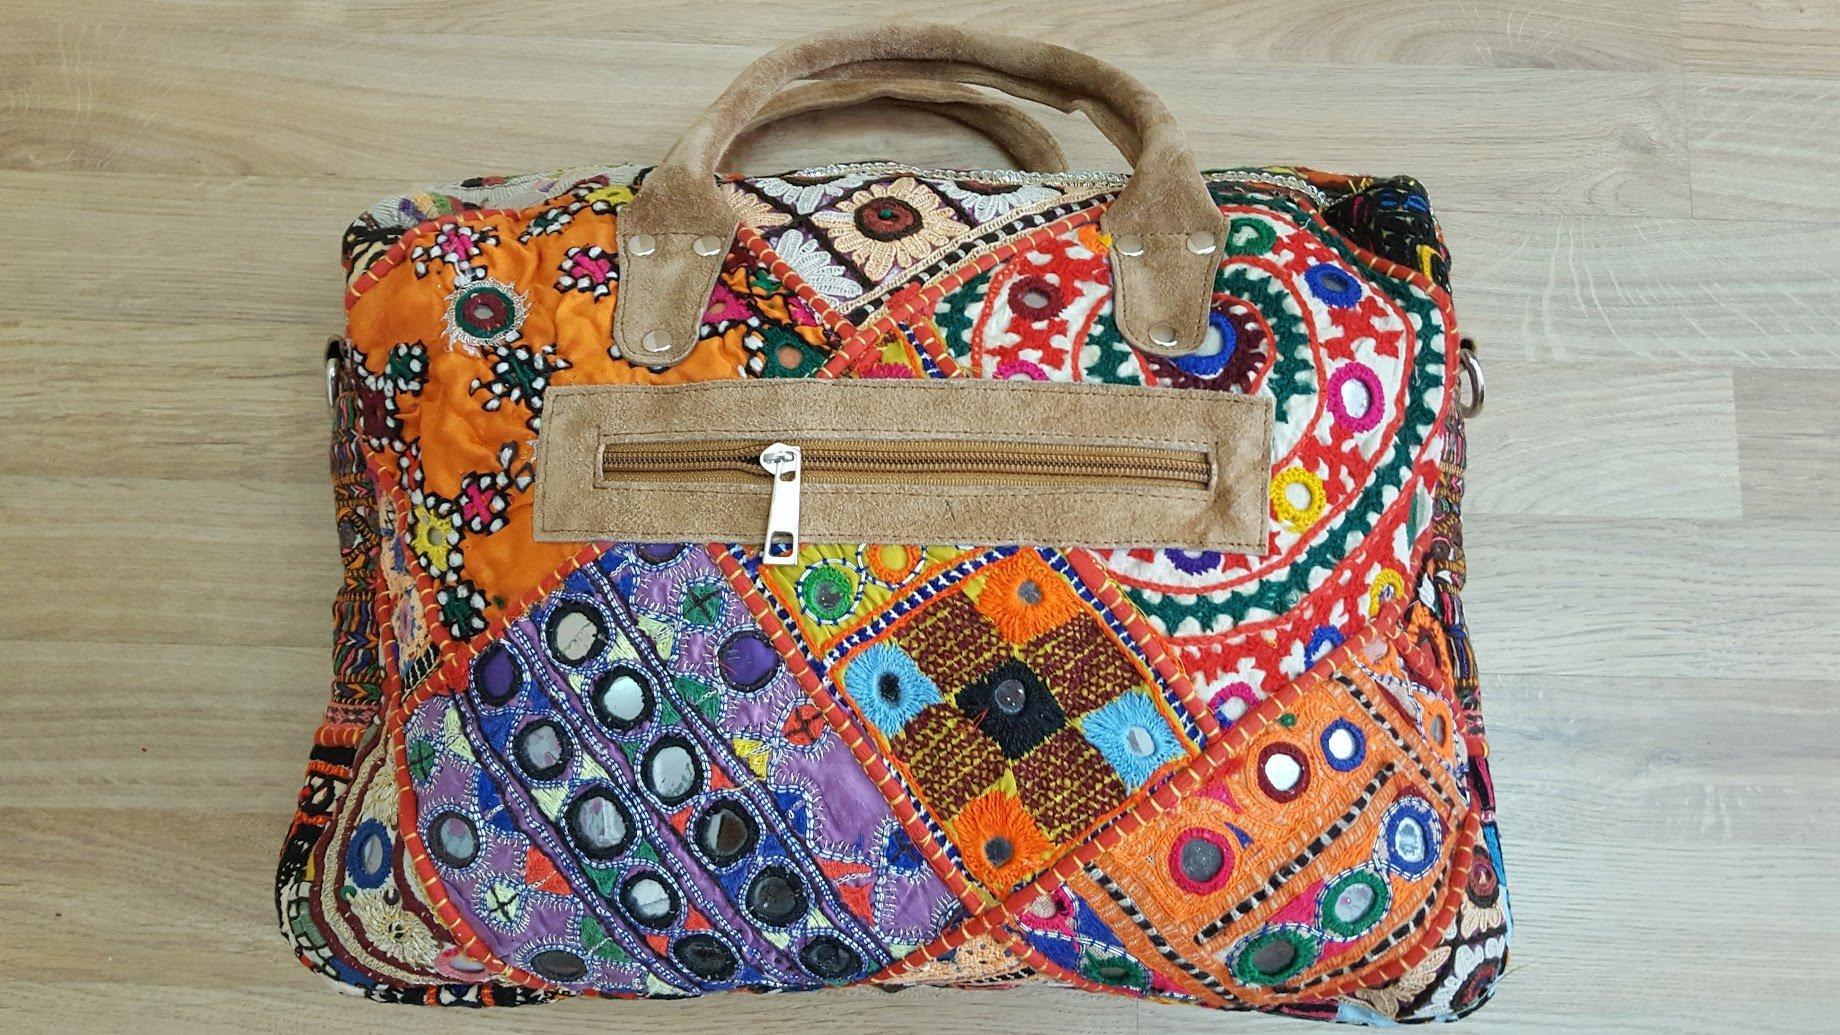 Top handle HAND EMBROIDERED shoulder bag, Cross Body Bag, Weekend Bag, Baby Bag, Laptop Bag